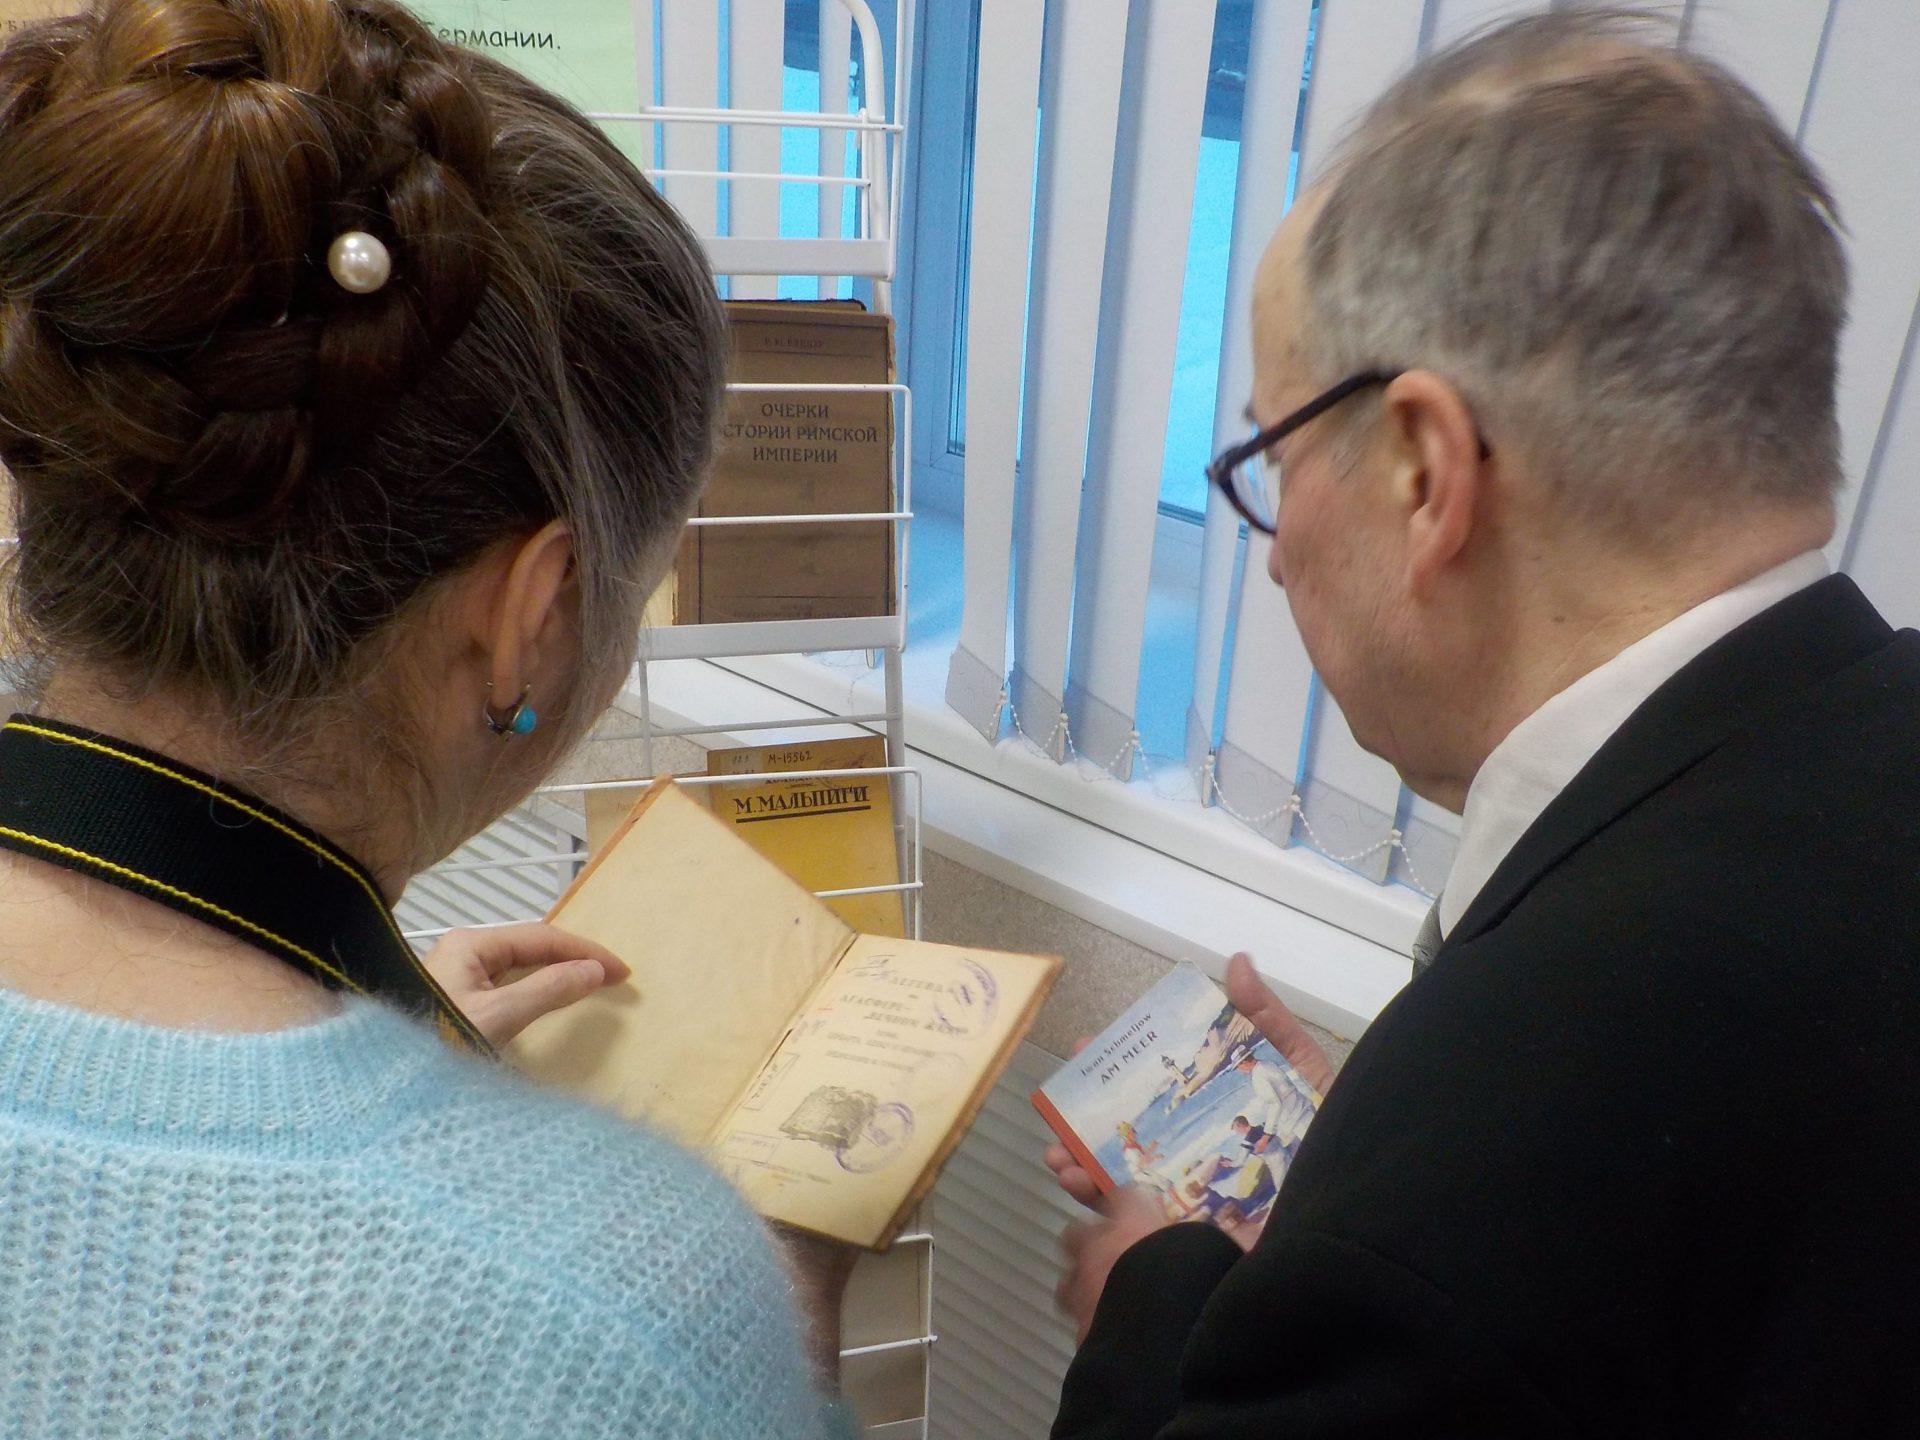 Professor i Nadejda Egorova u stenda s redkimi knigami